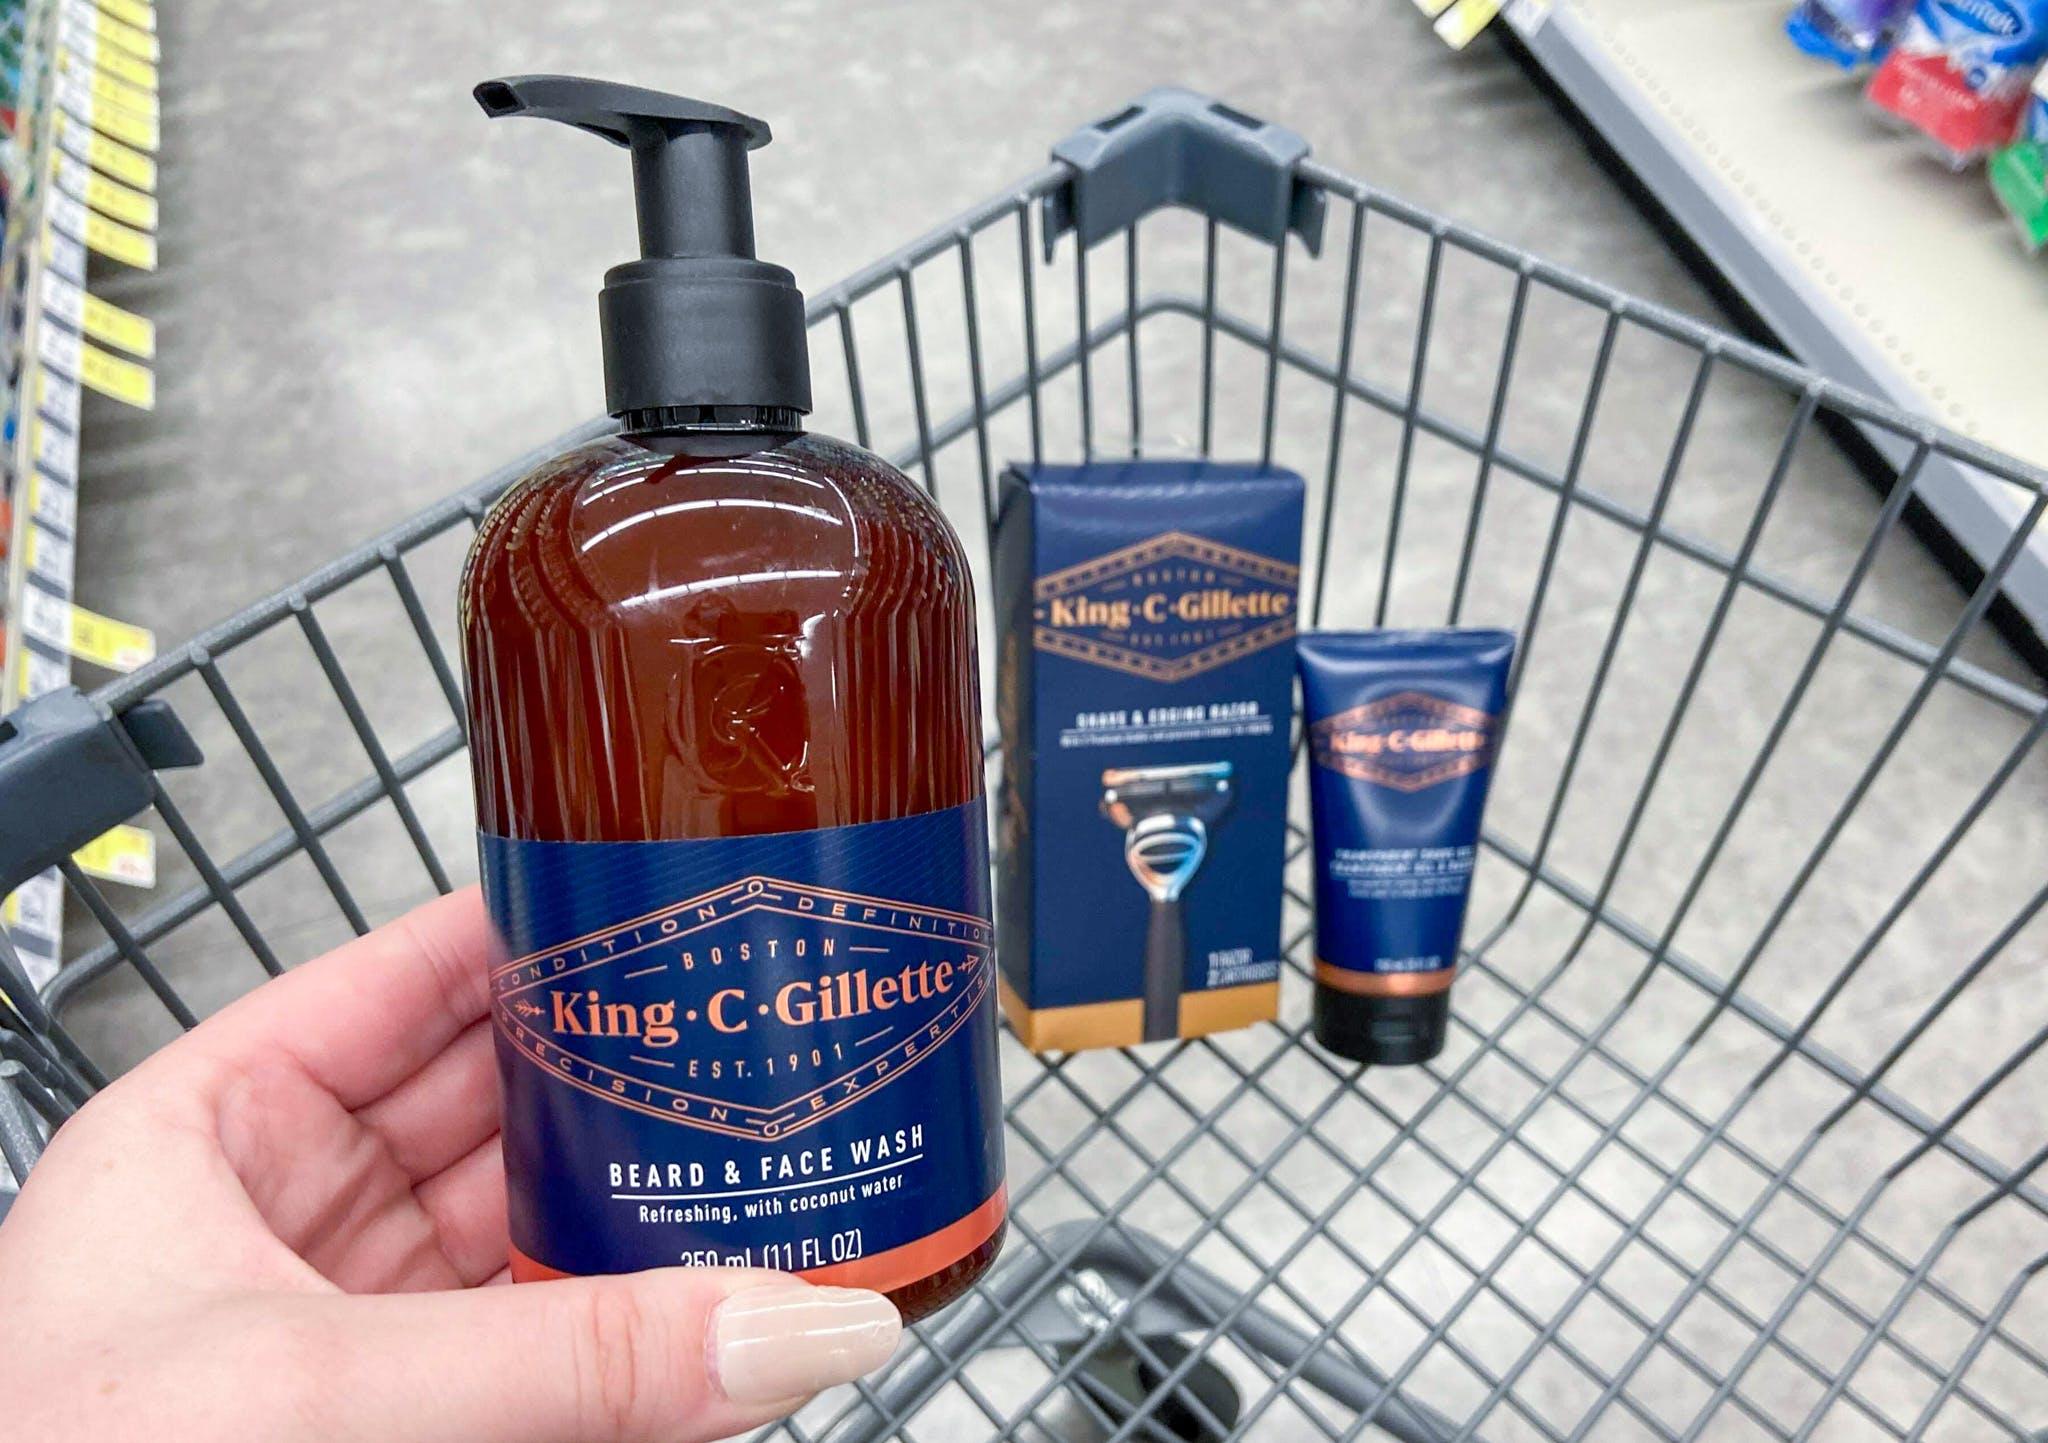 King C. Gillette Shave & Beard Care, $4.66 at Walgreens ...